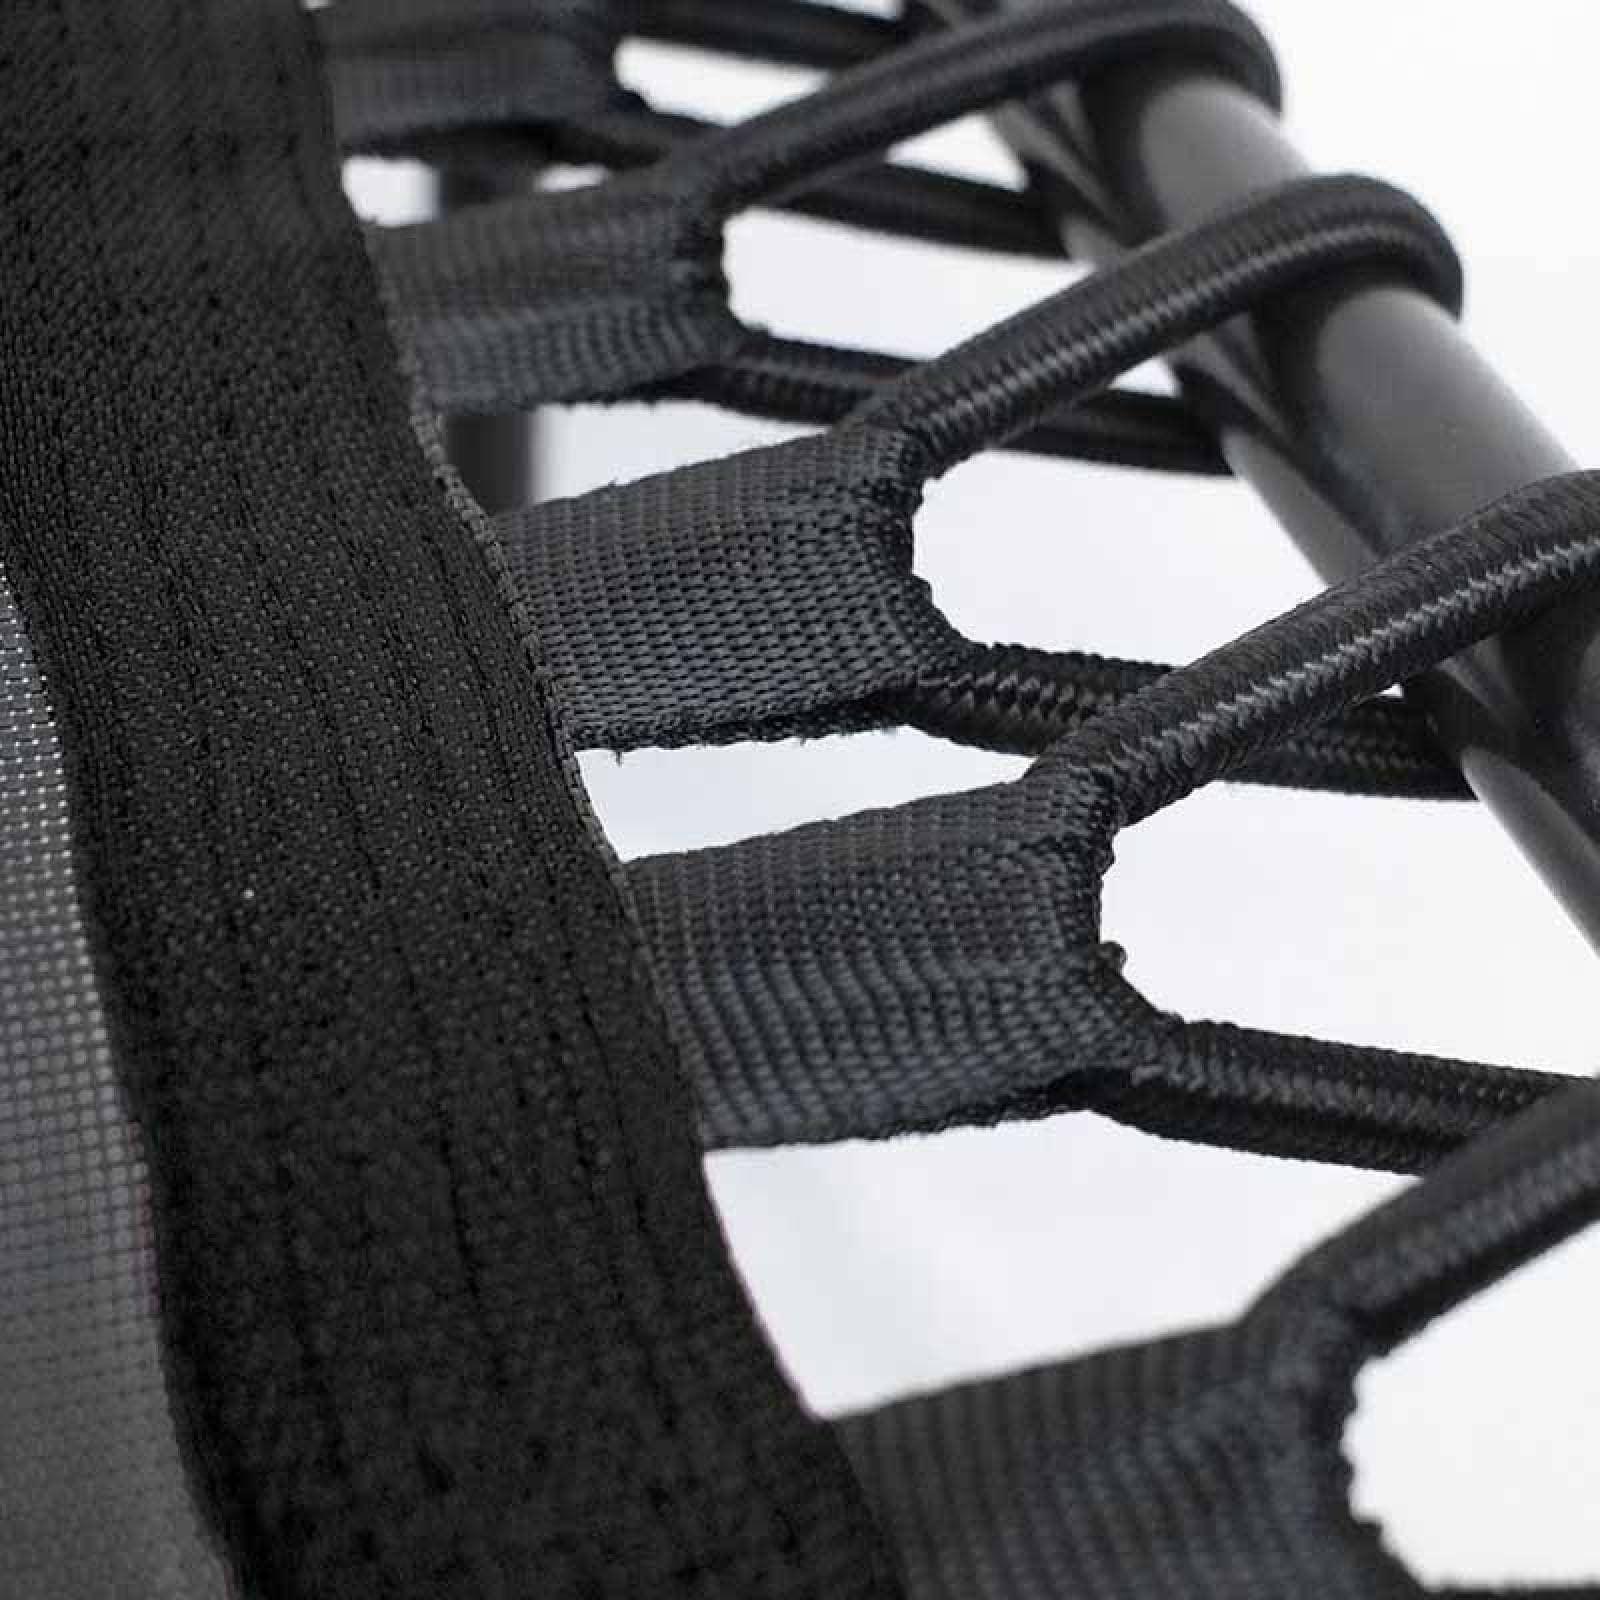 "Trampolin Hexagonal 50"" Barra Ejercicio 150KG Fitness Ejercicio Agarradera Gym Aerobics Negro"